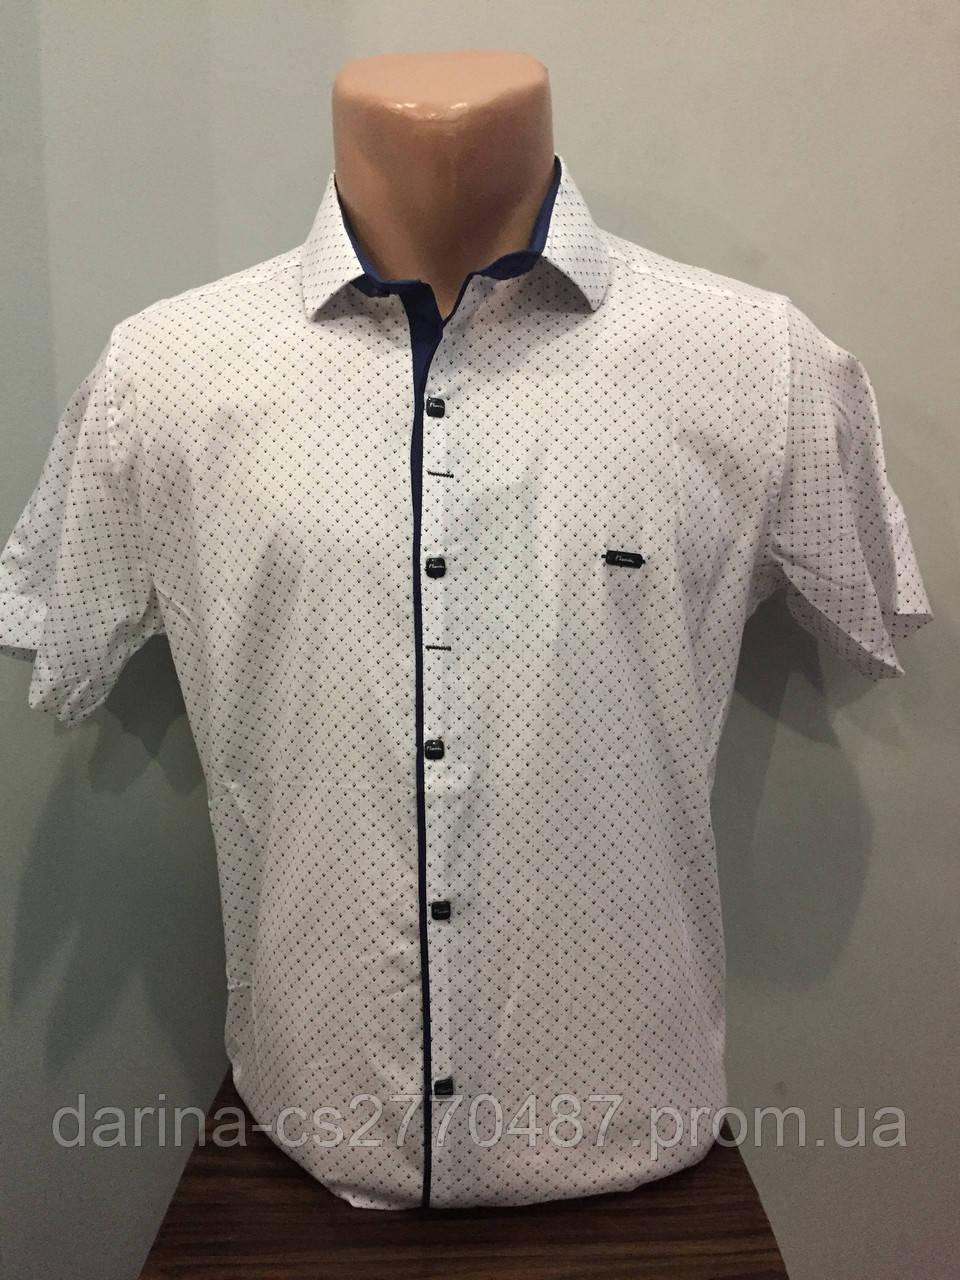 Мужская рубашка стрейч котон XL,2XL